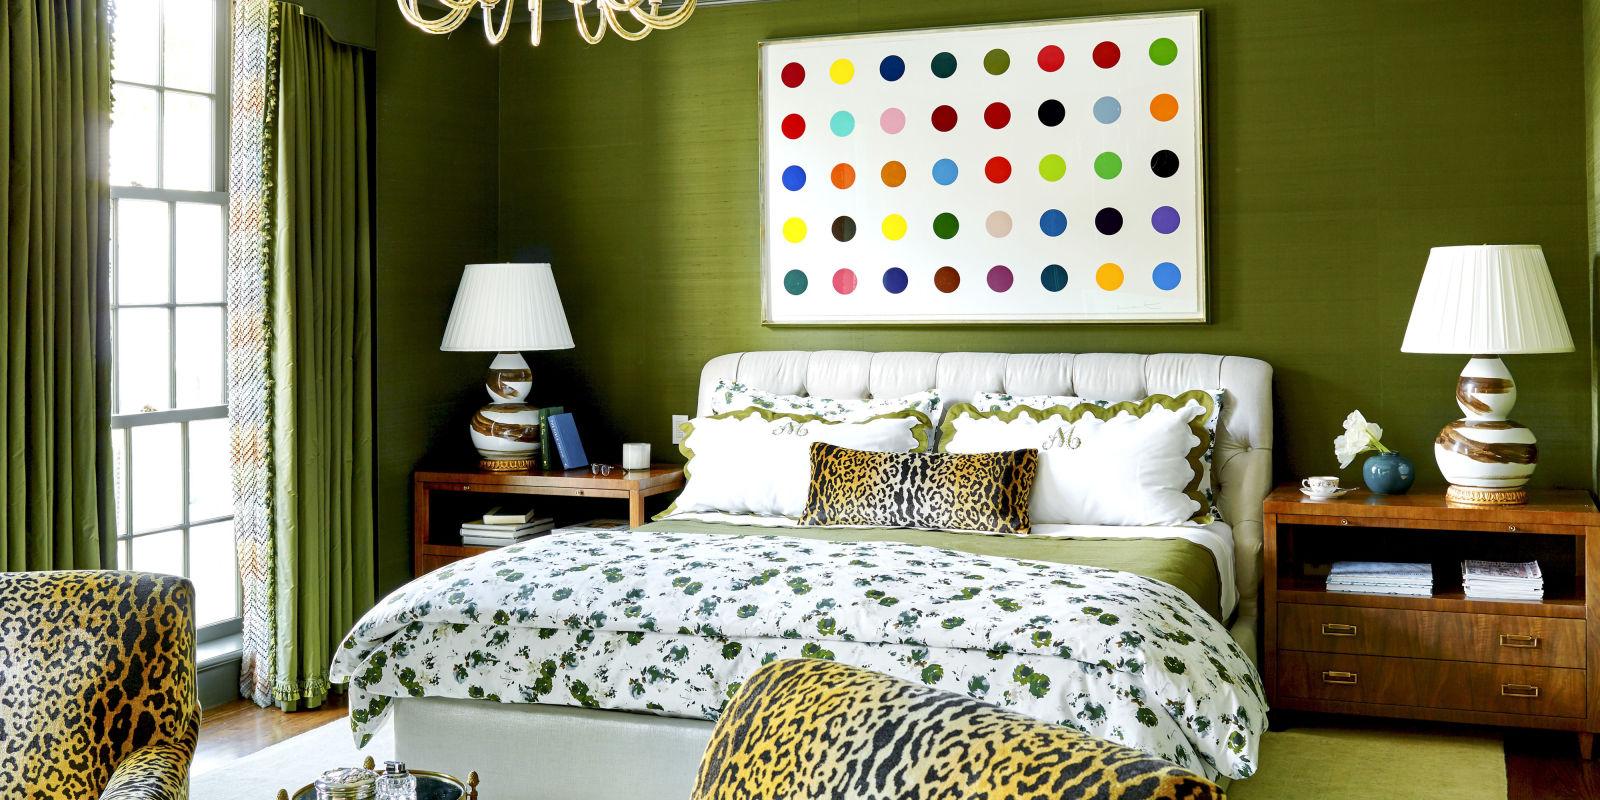 25 Best Interior Decorating Secrets - Decorating ips and ricks ... - ^